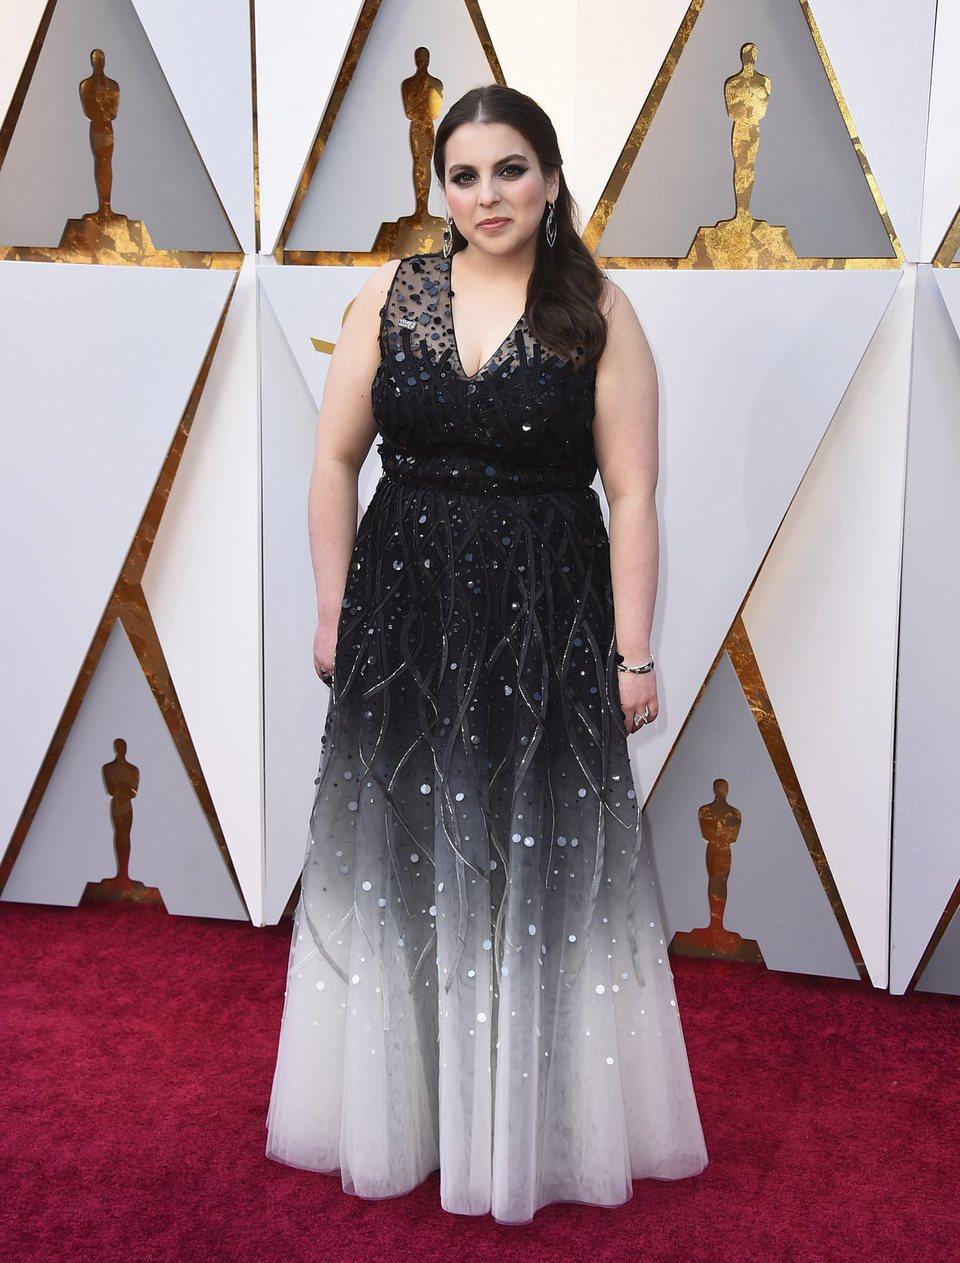 Beanie Feldstein at Oscars 2018 the red carpet